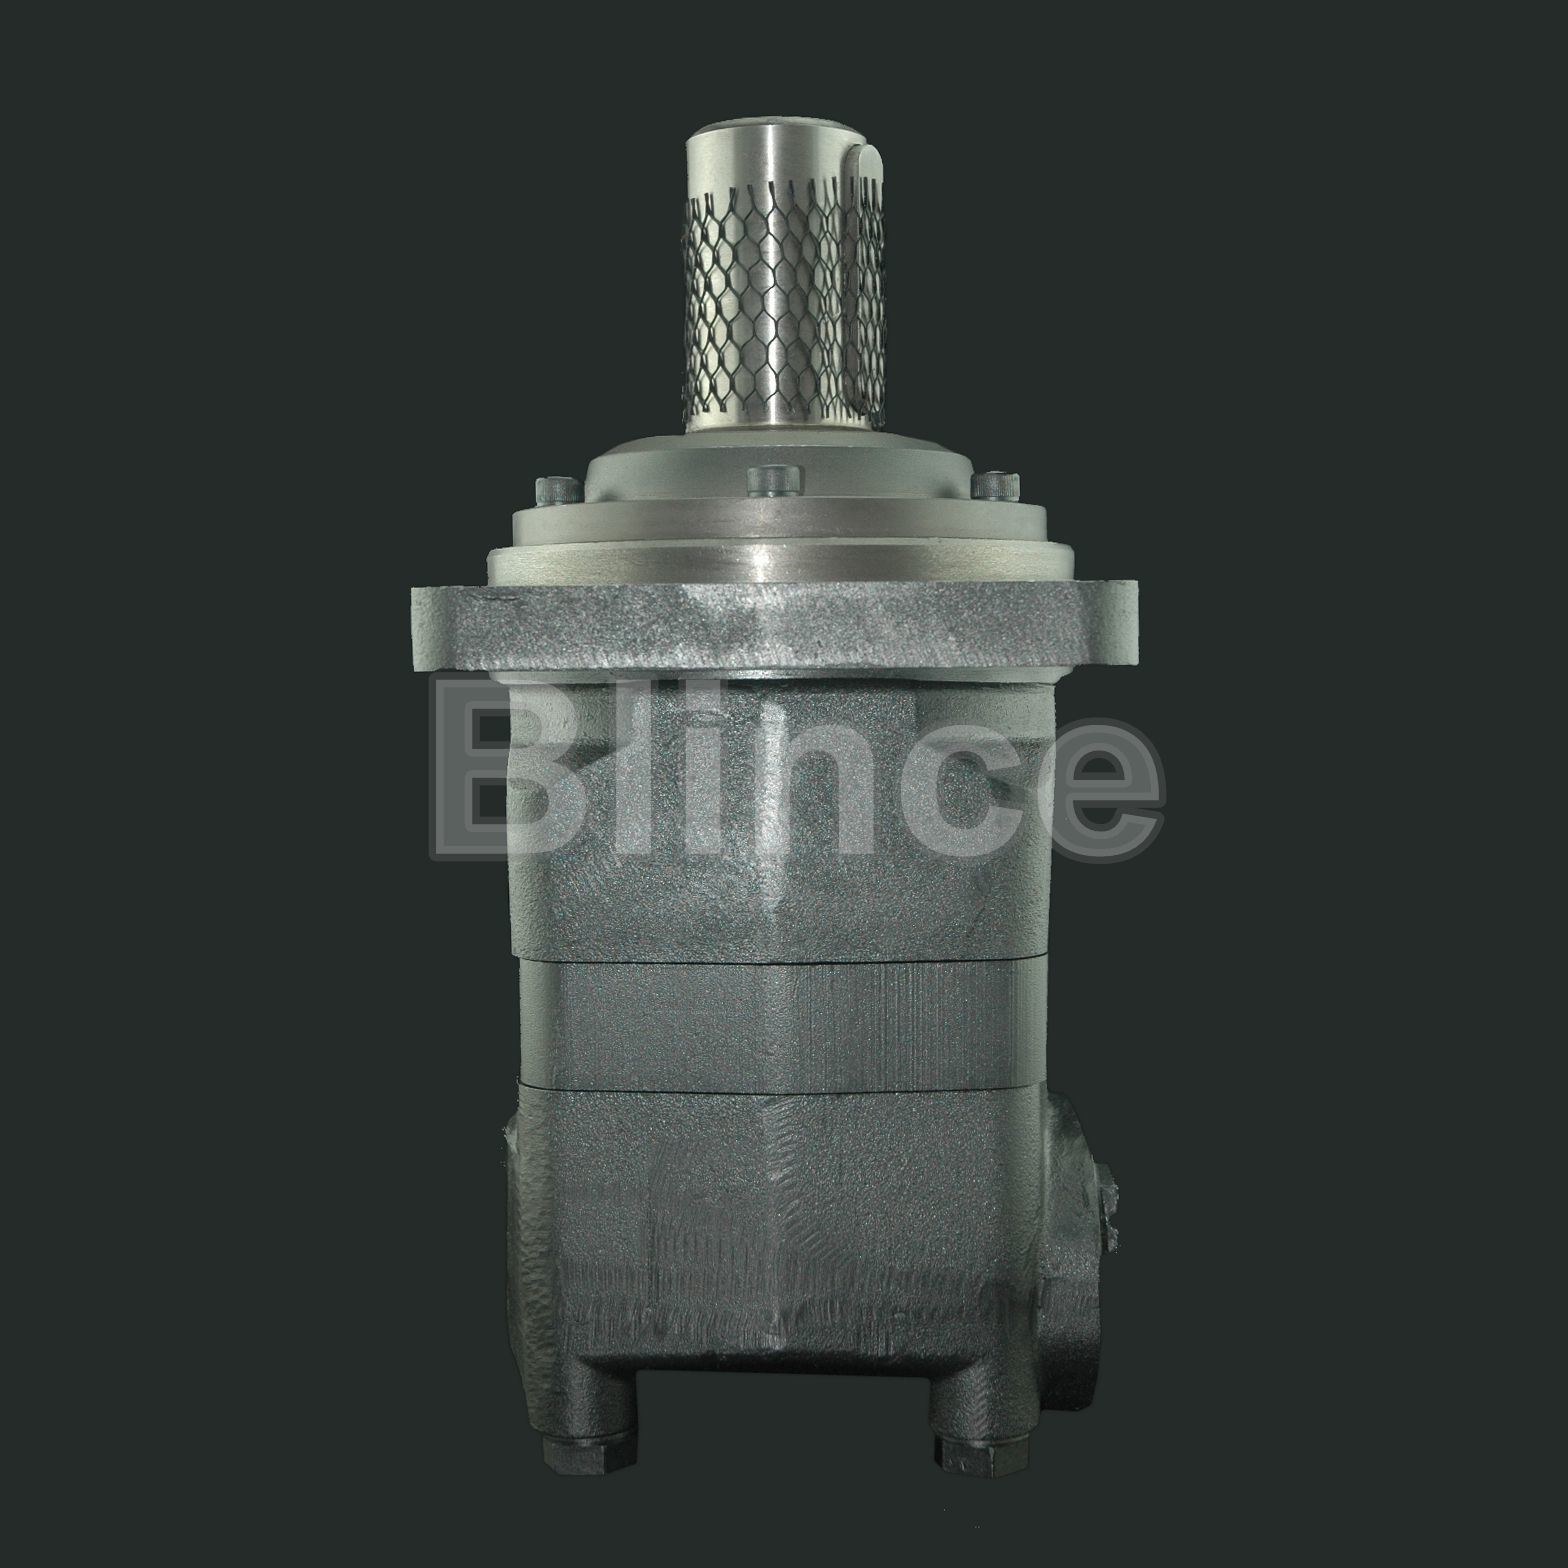 Low Speed High Torque Hydraulic Motor Omv400 for Jack